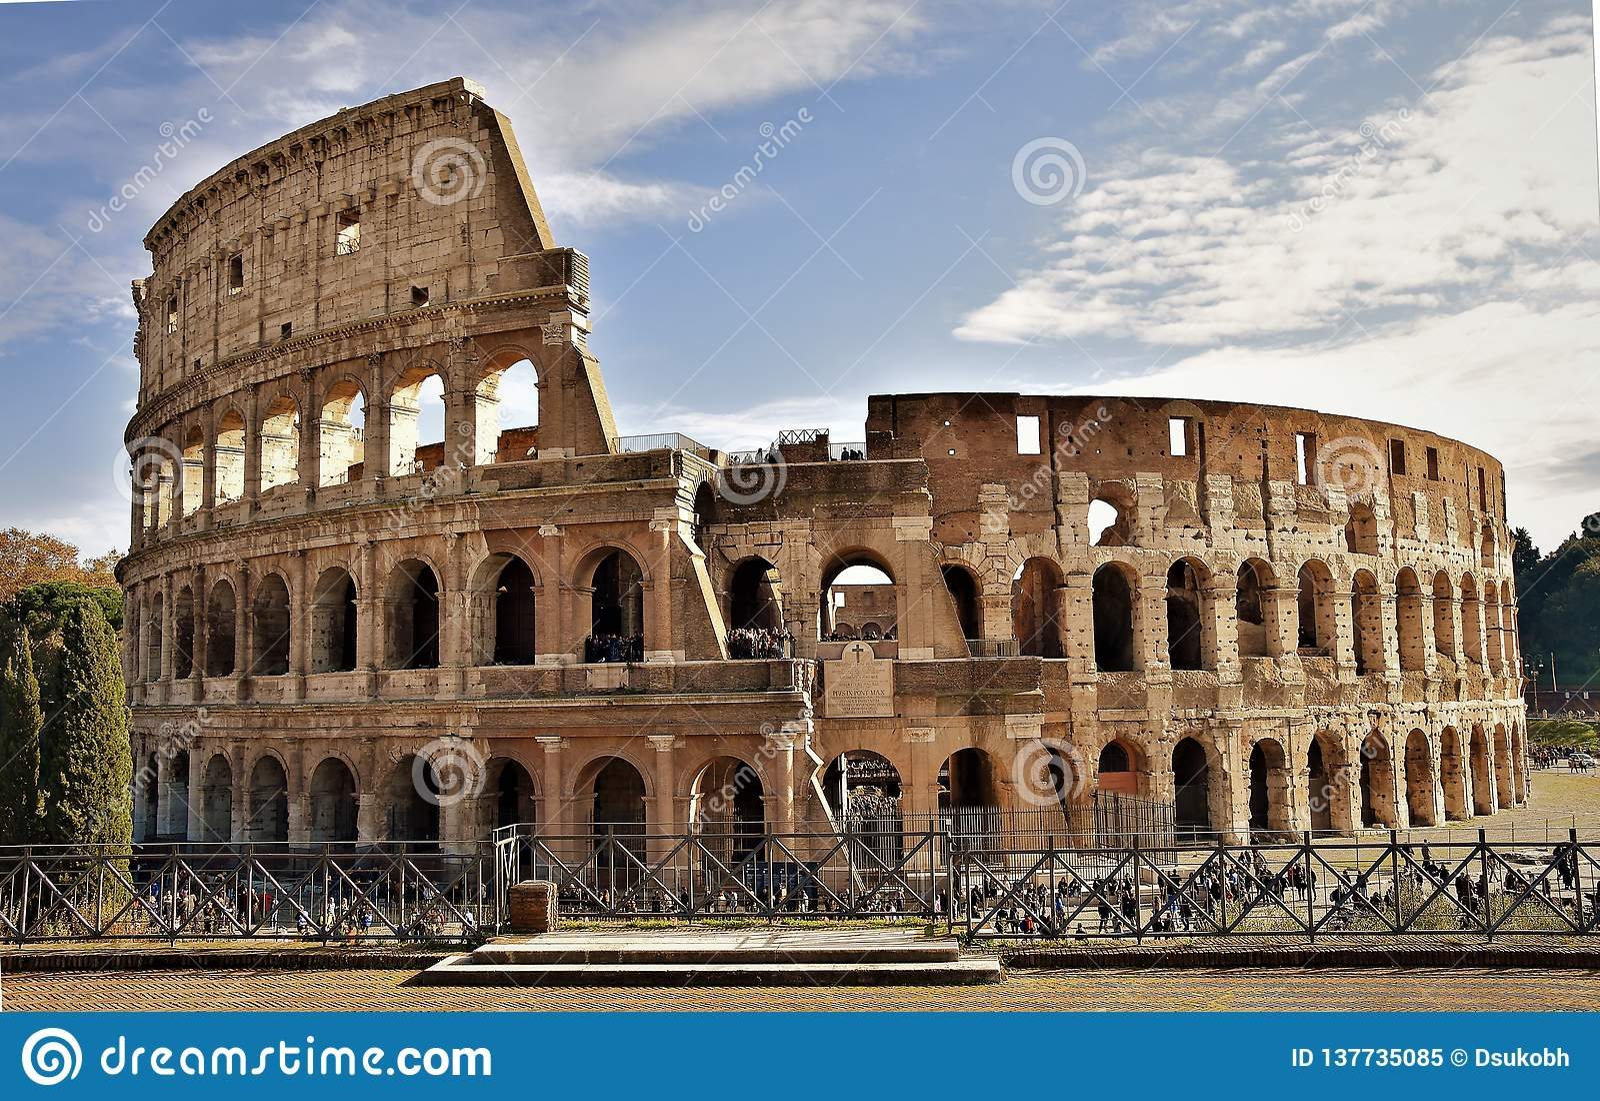 Романо colosseo Il, Италия